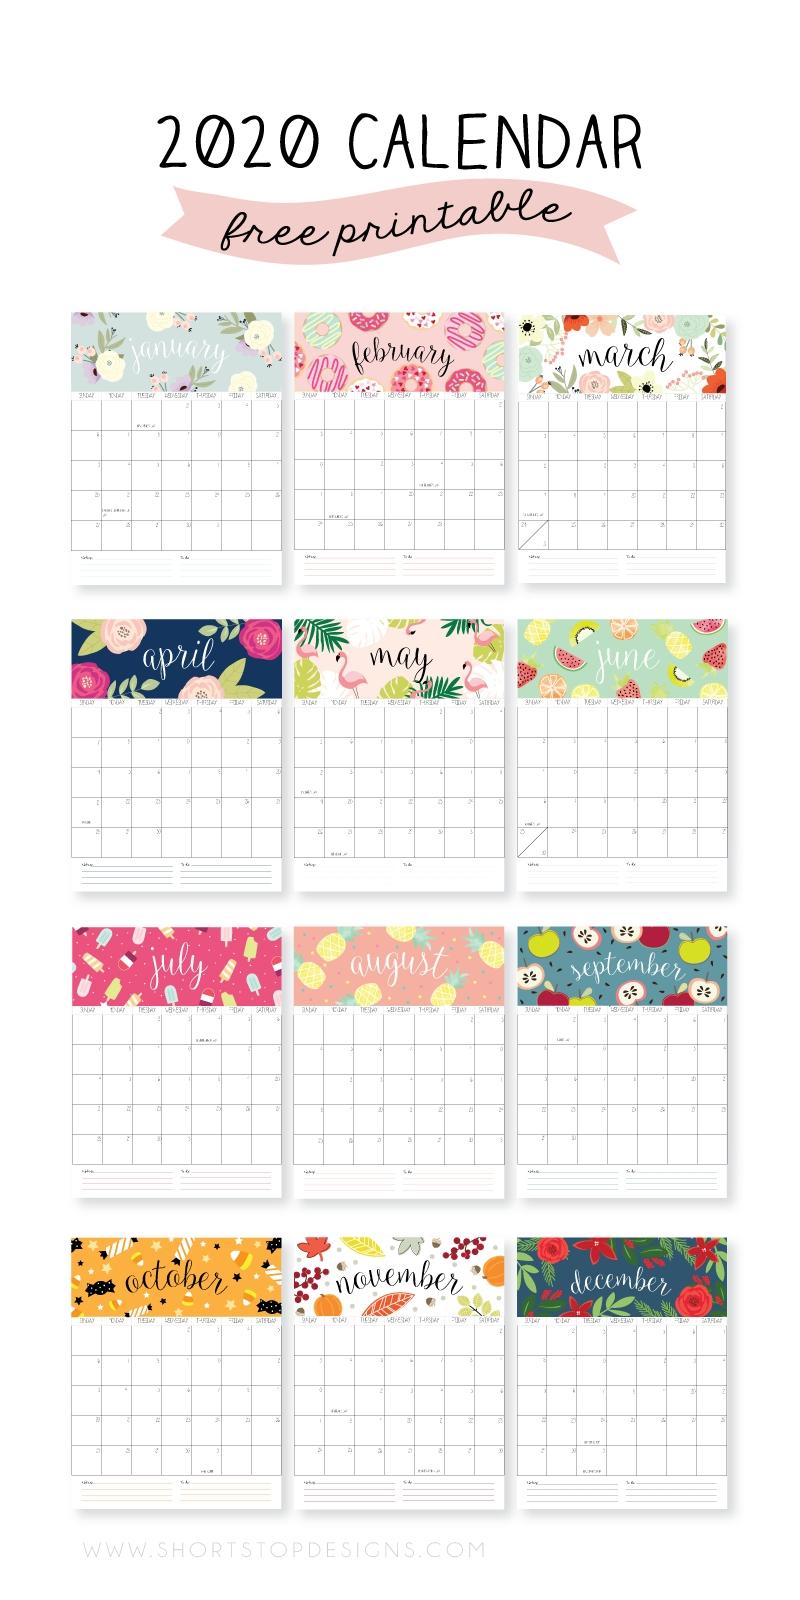 Short Timers Calendar Printable :-Free Calendar Template